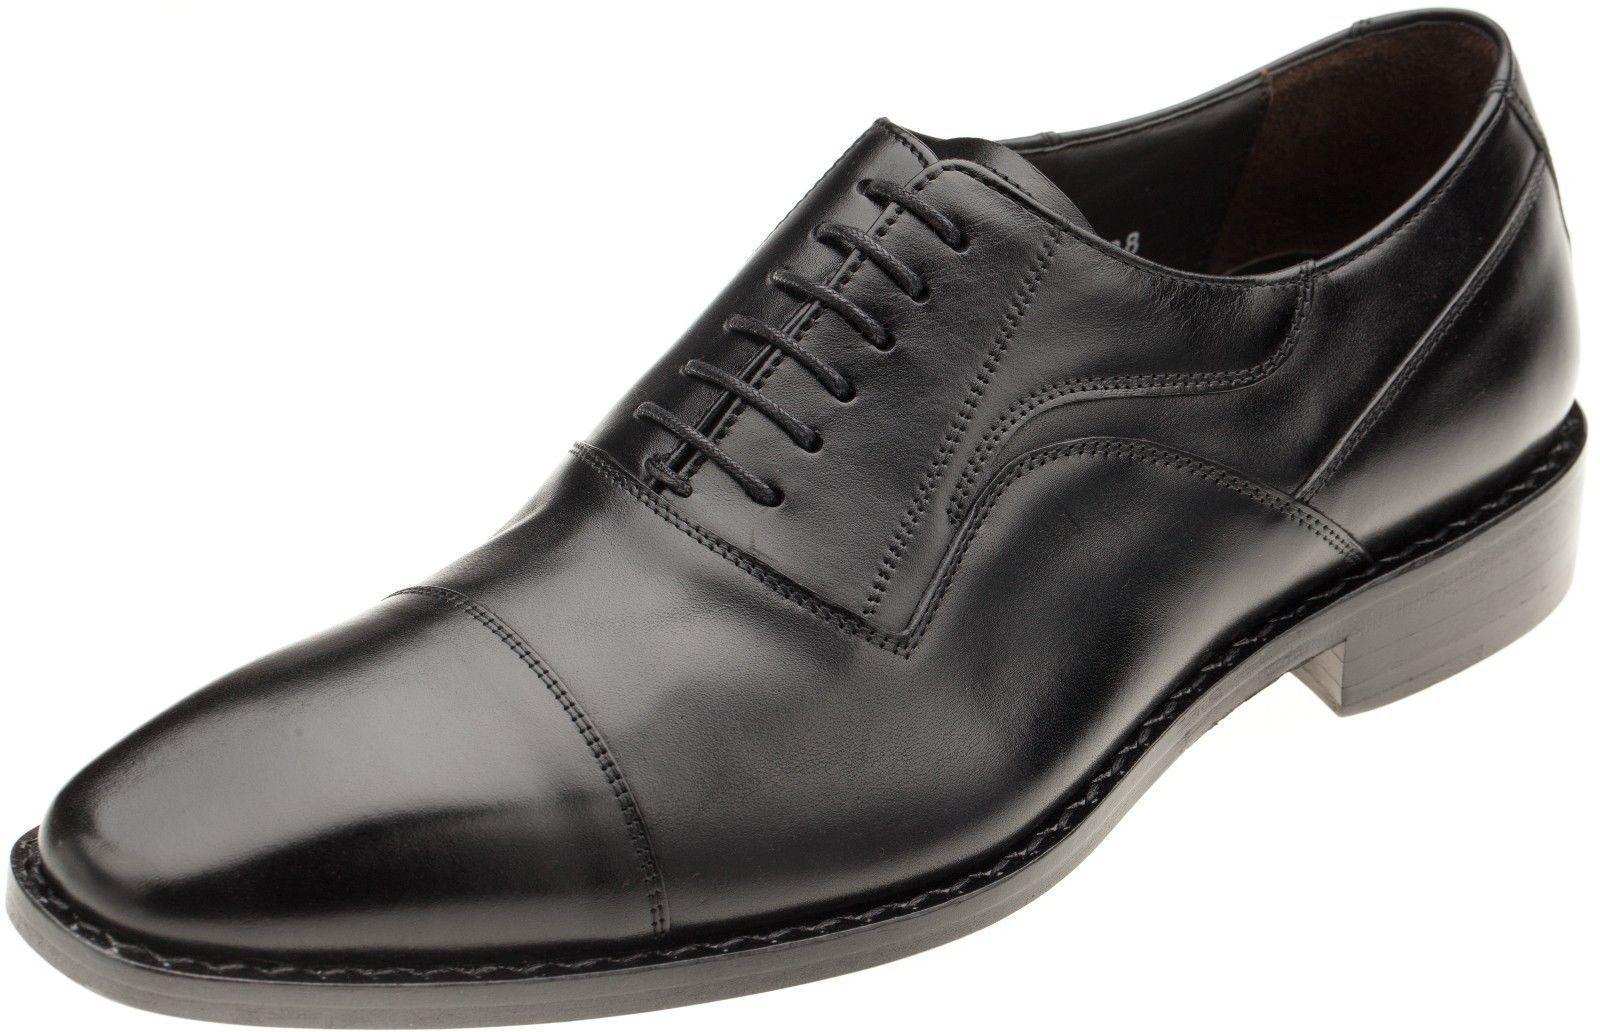 Sconto del 70% Mezlan Mezlan Mezlan Uomo 12912 nero Leather Cap Toe Oxford Dress Shoe  marchi di stilisti economici